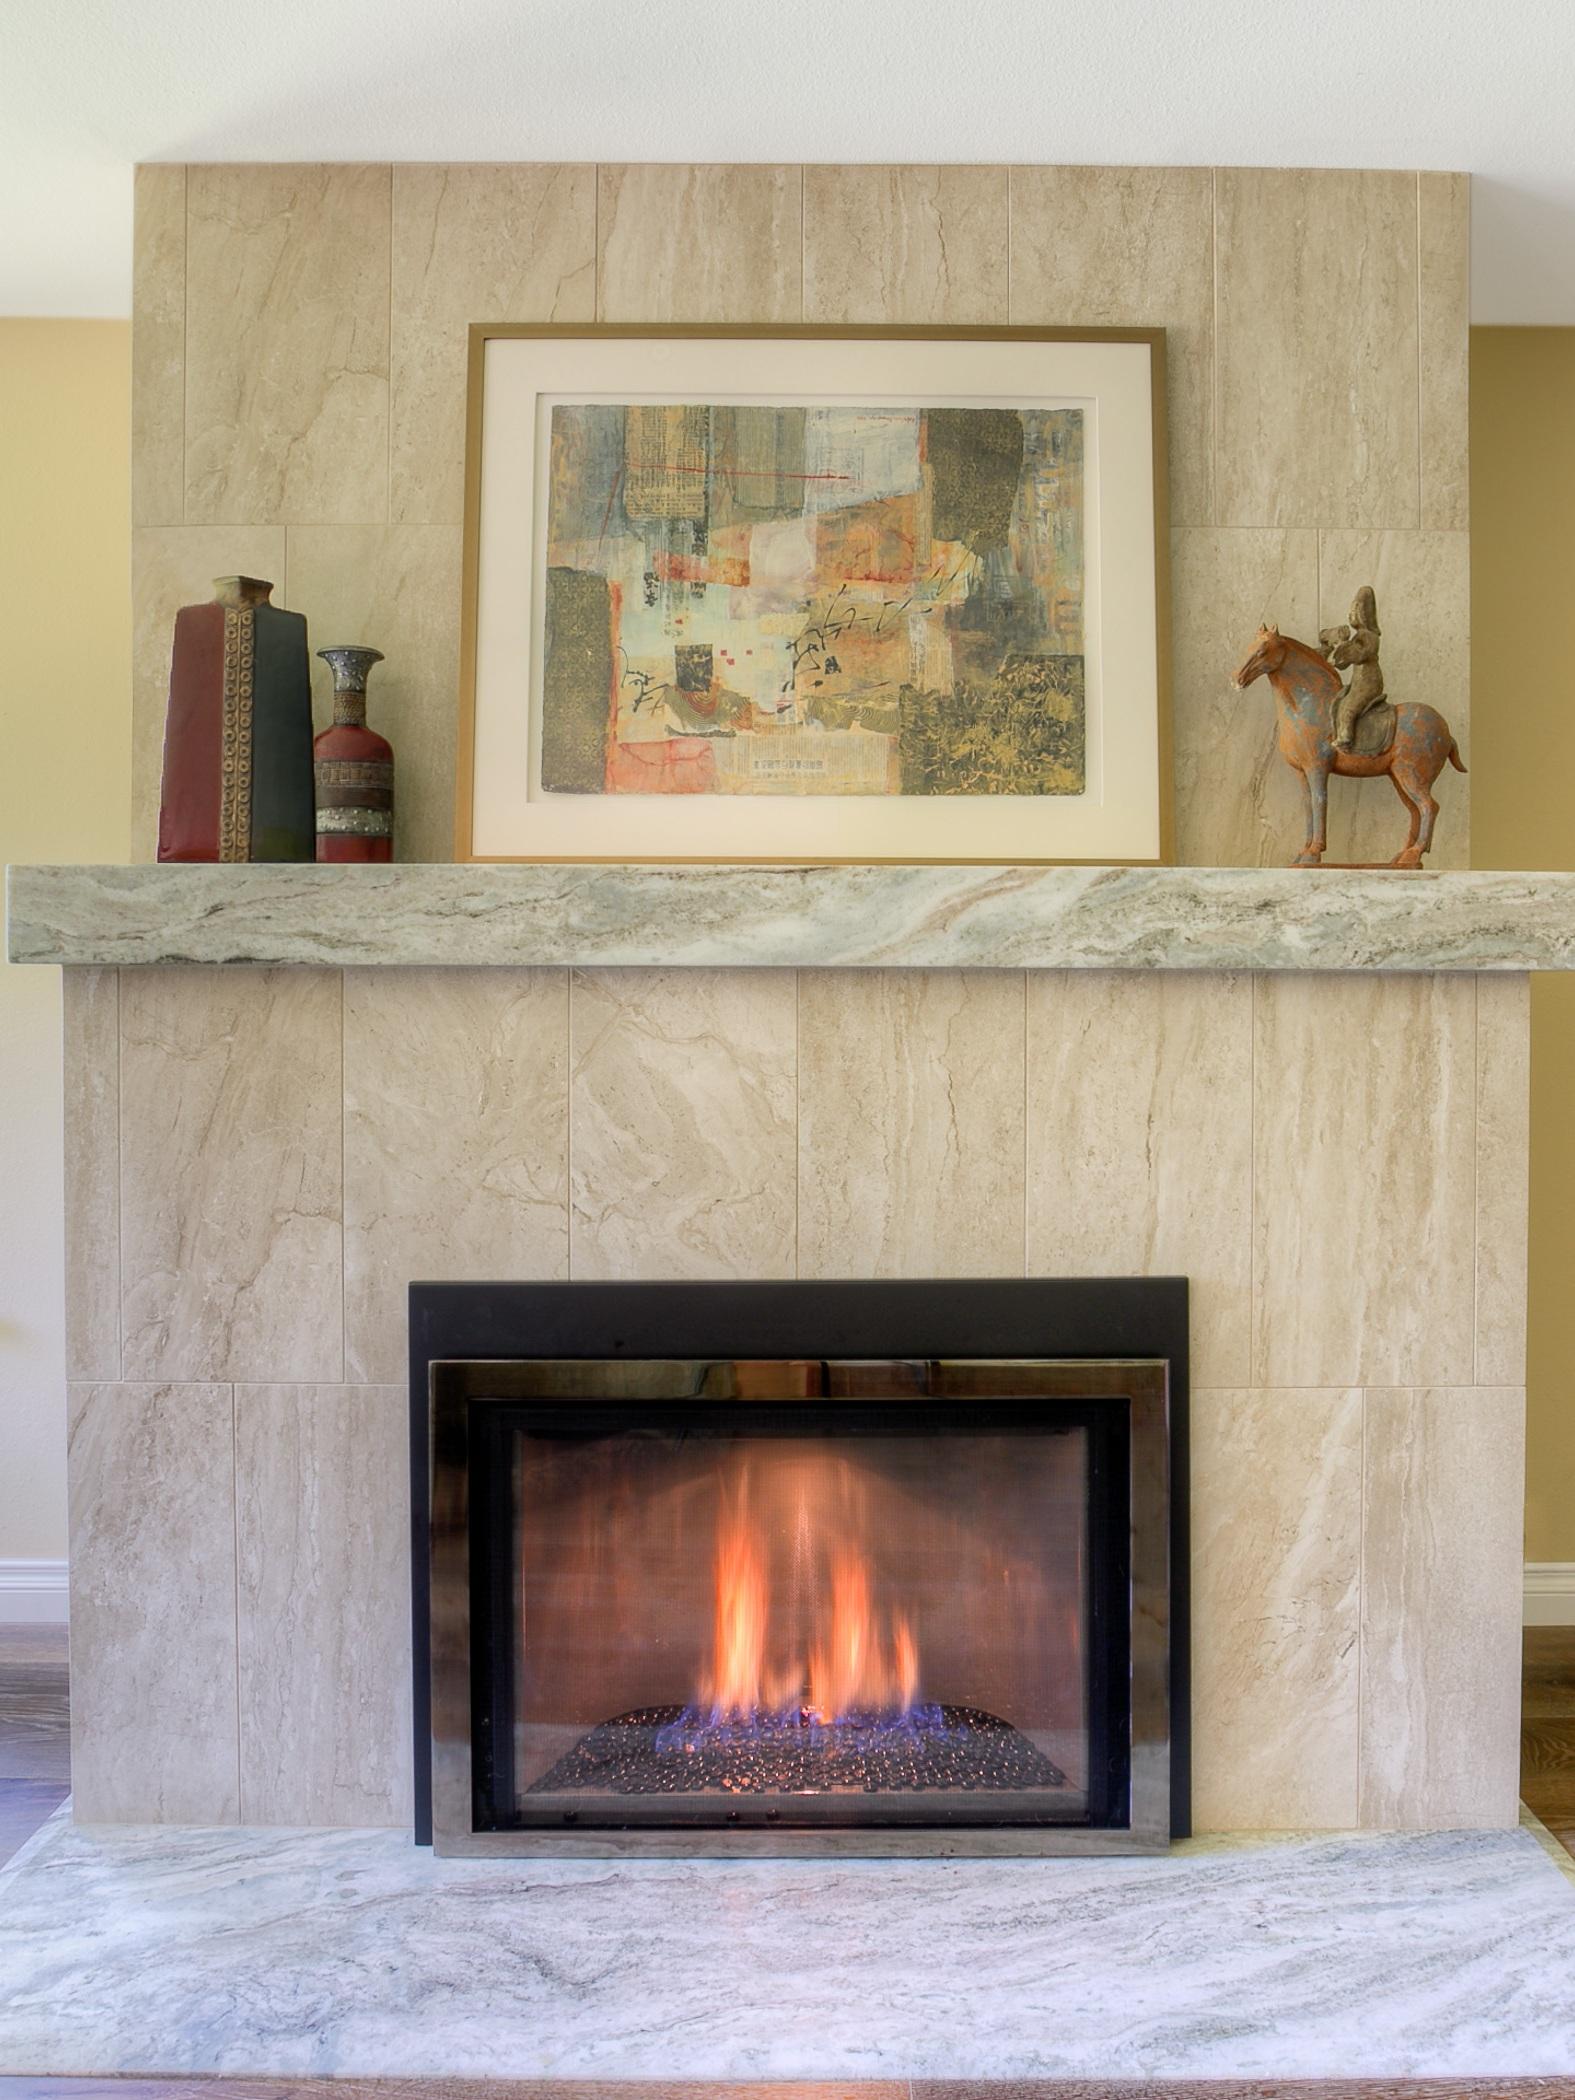 12-fireplace-auburn-wa.jpg